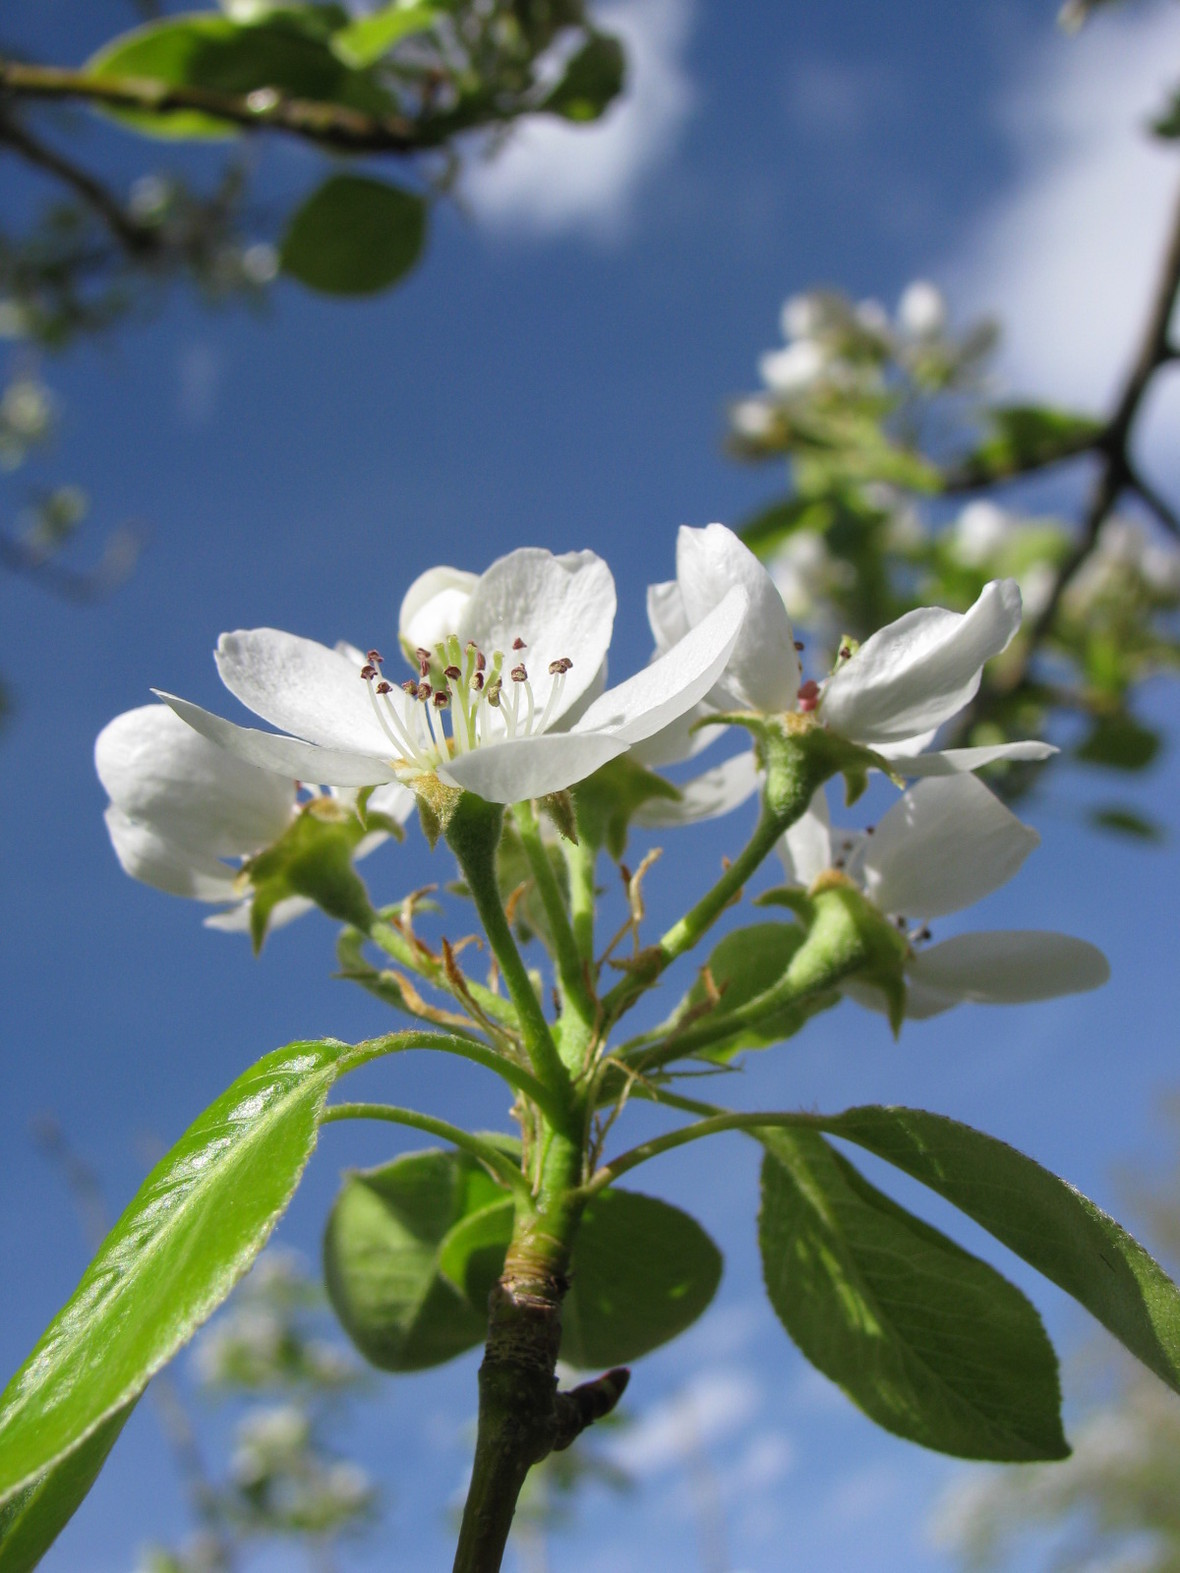 bloomin-trees-4-1355145